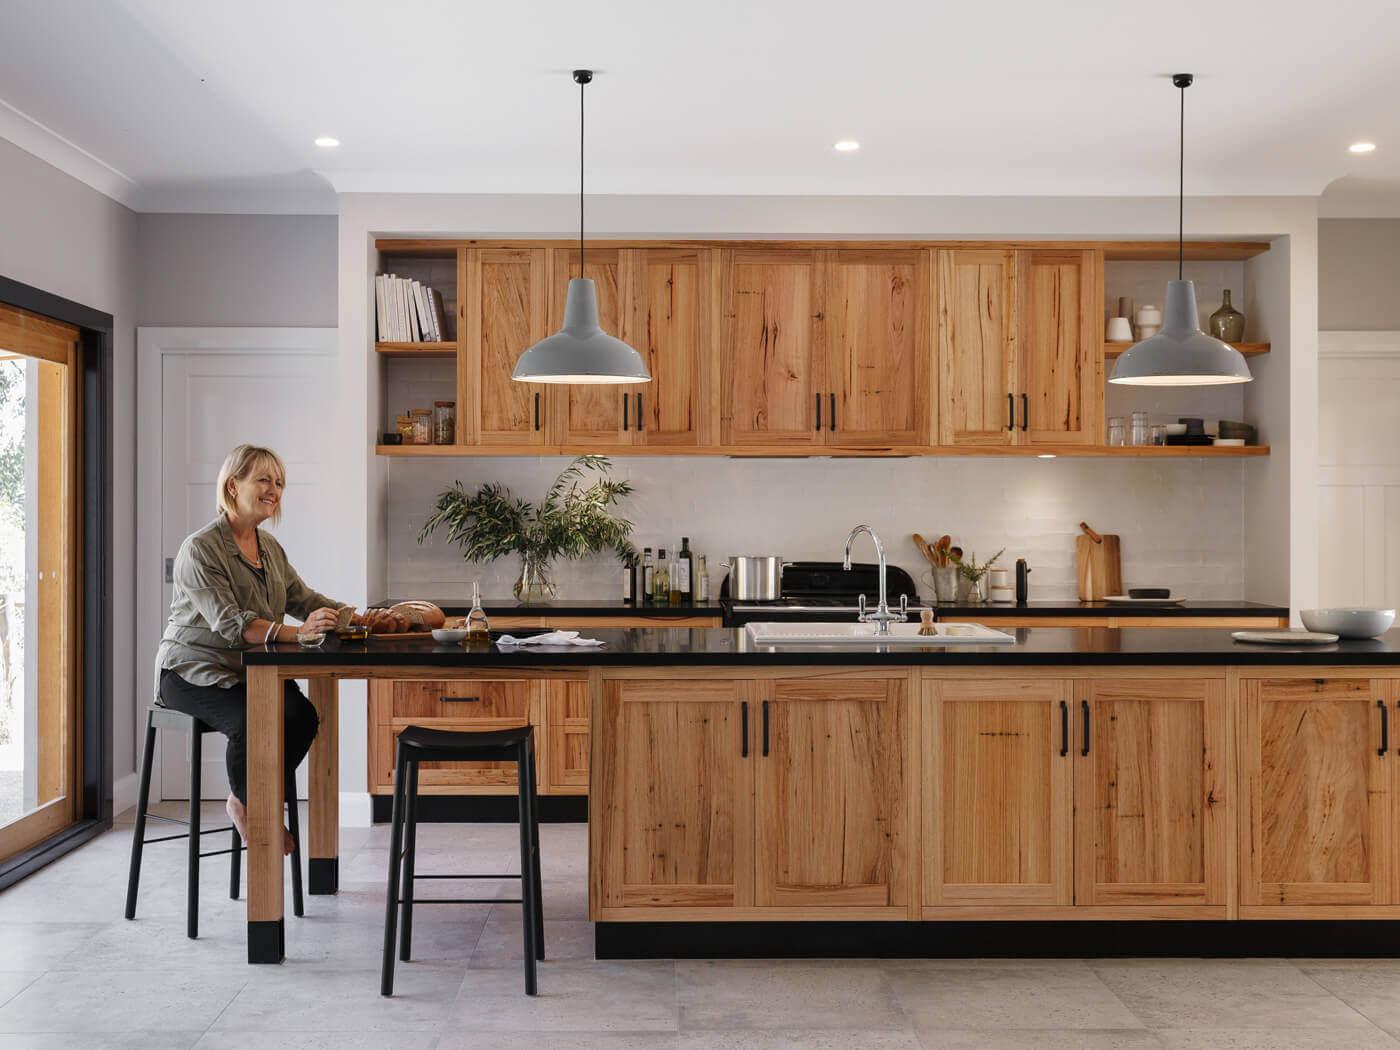 Quiet Kitchens are the Future